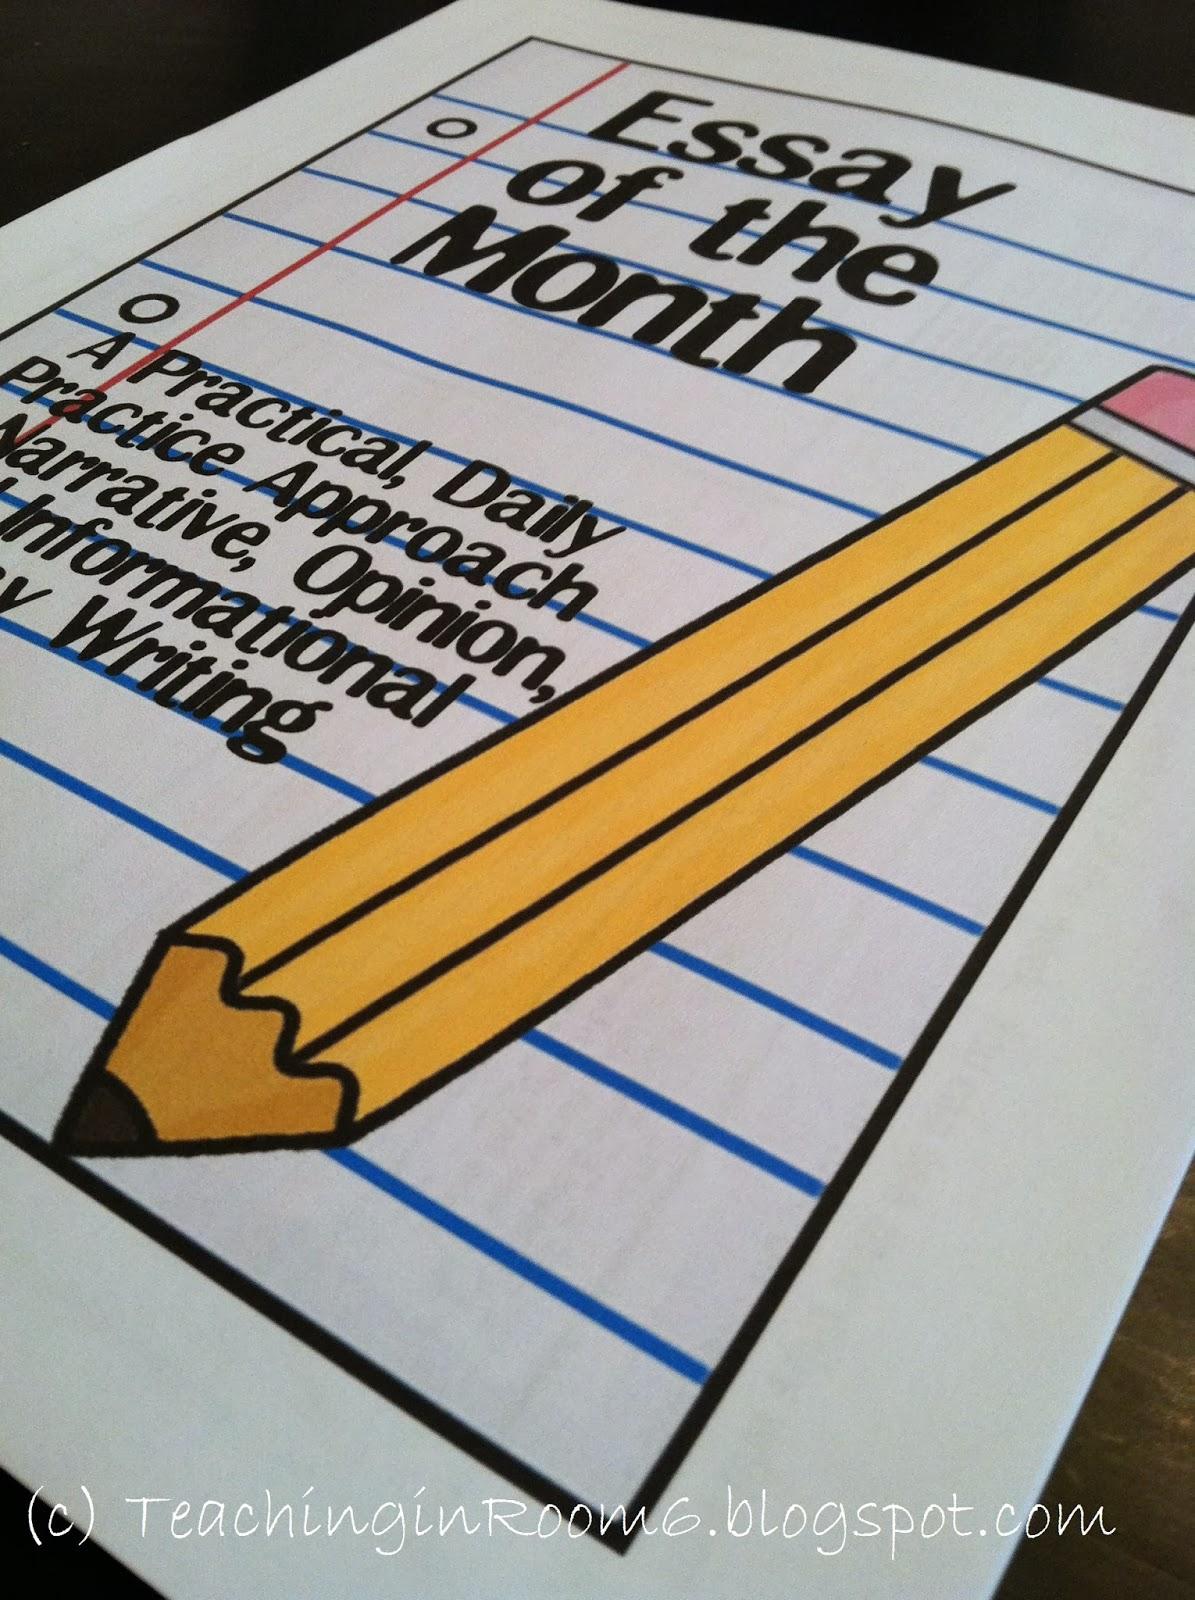 th grade essentials teaching in room